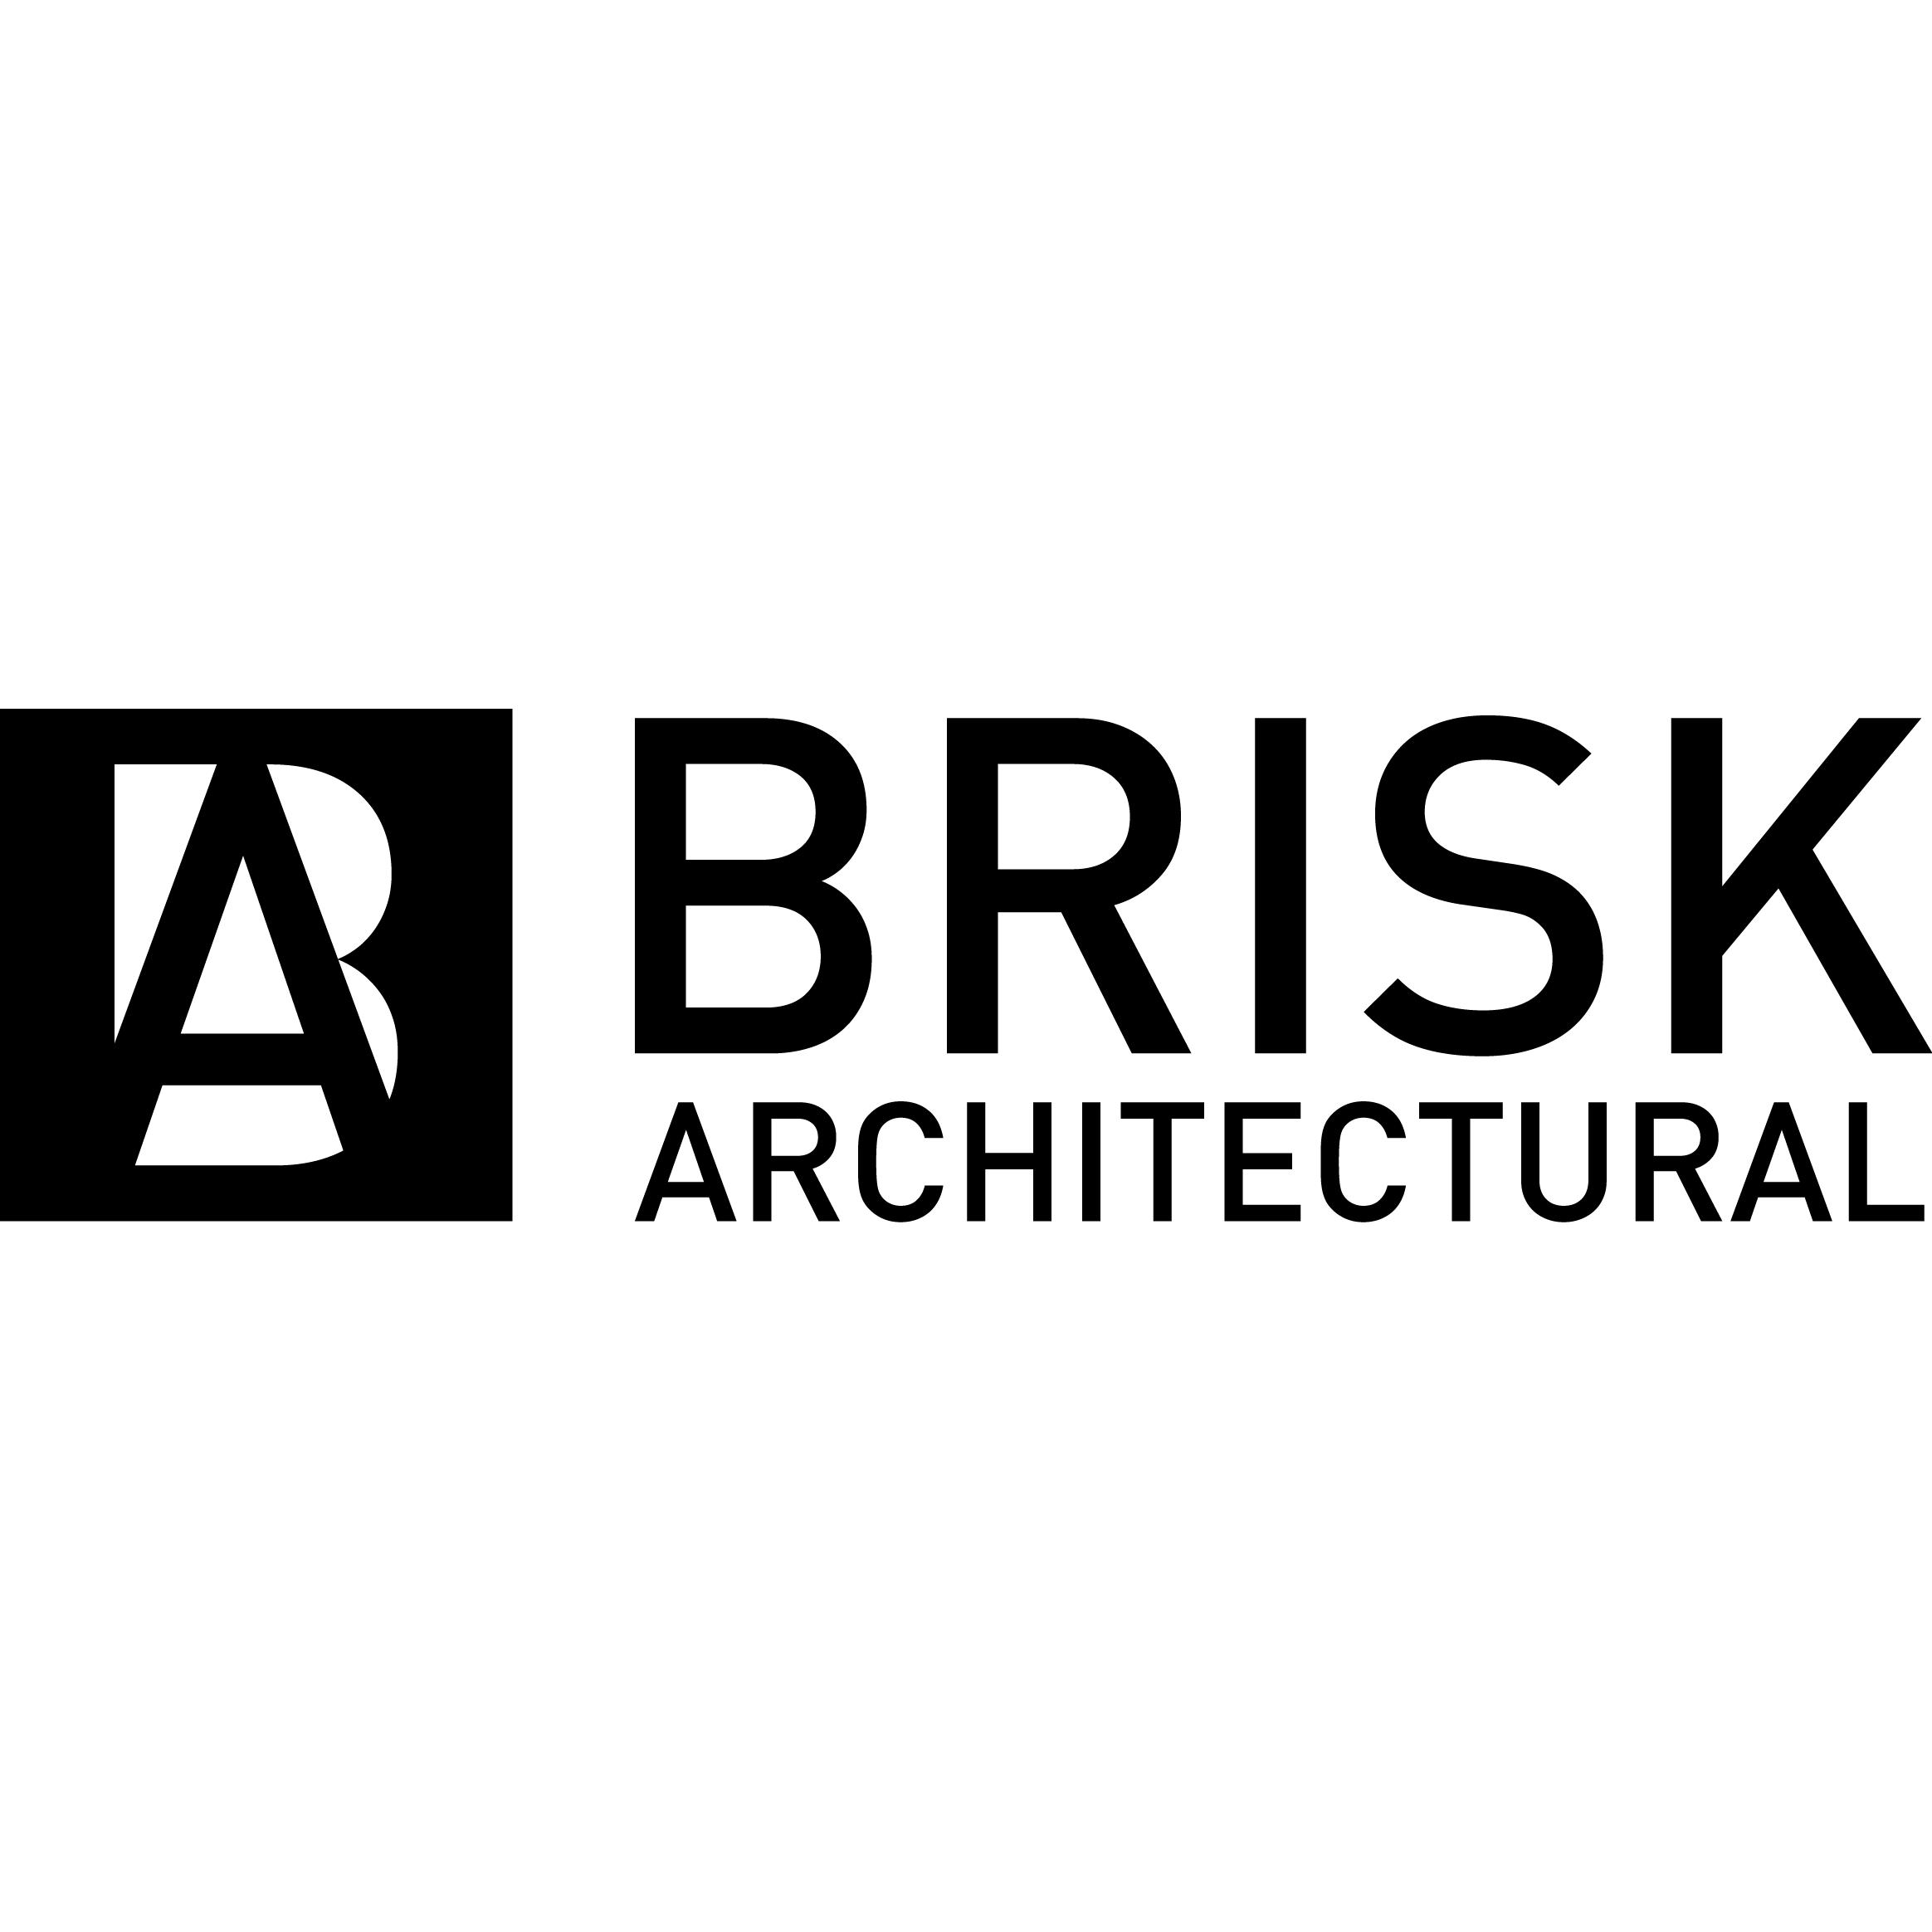 Architect in NJ Elizabeth 07201 Brisk Architectural 720 Dowd Ave.  (877)816-2887